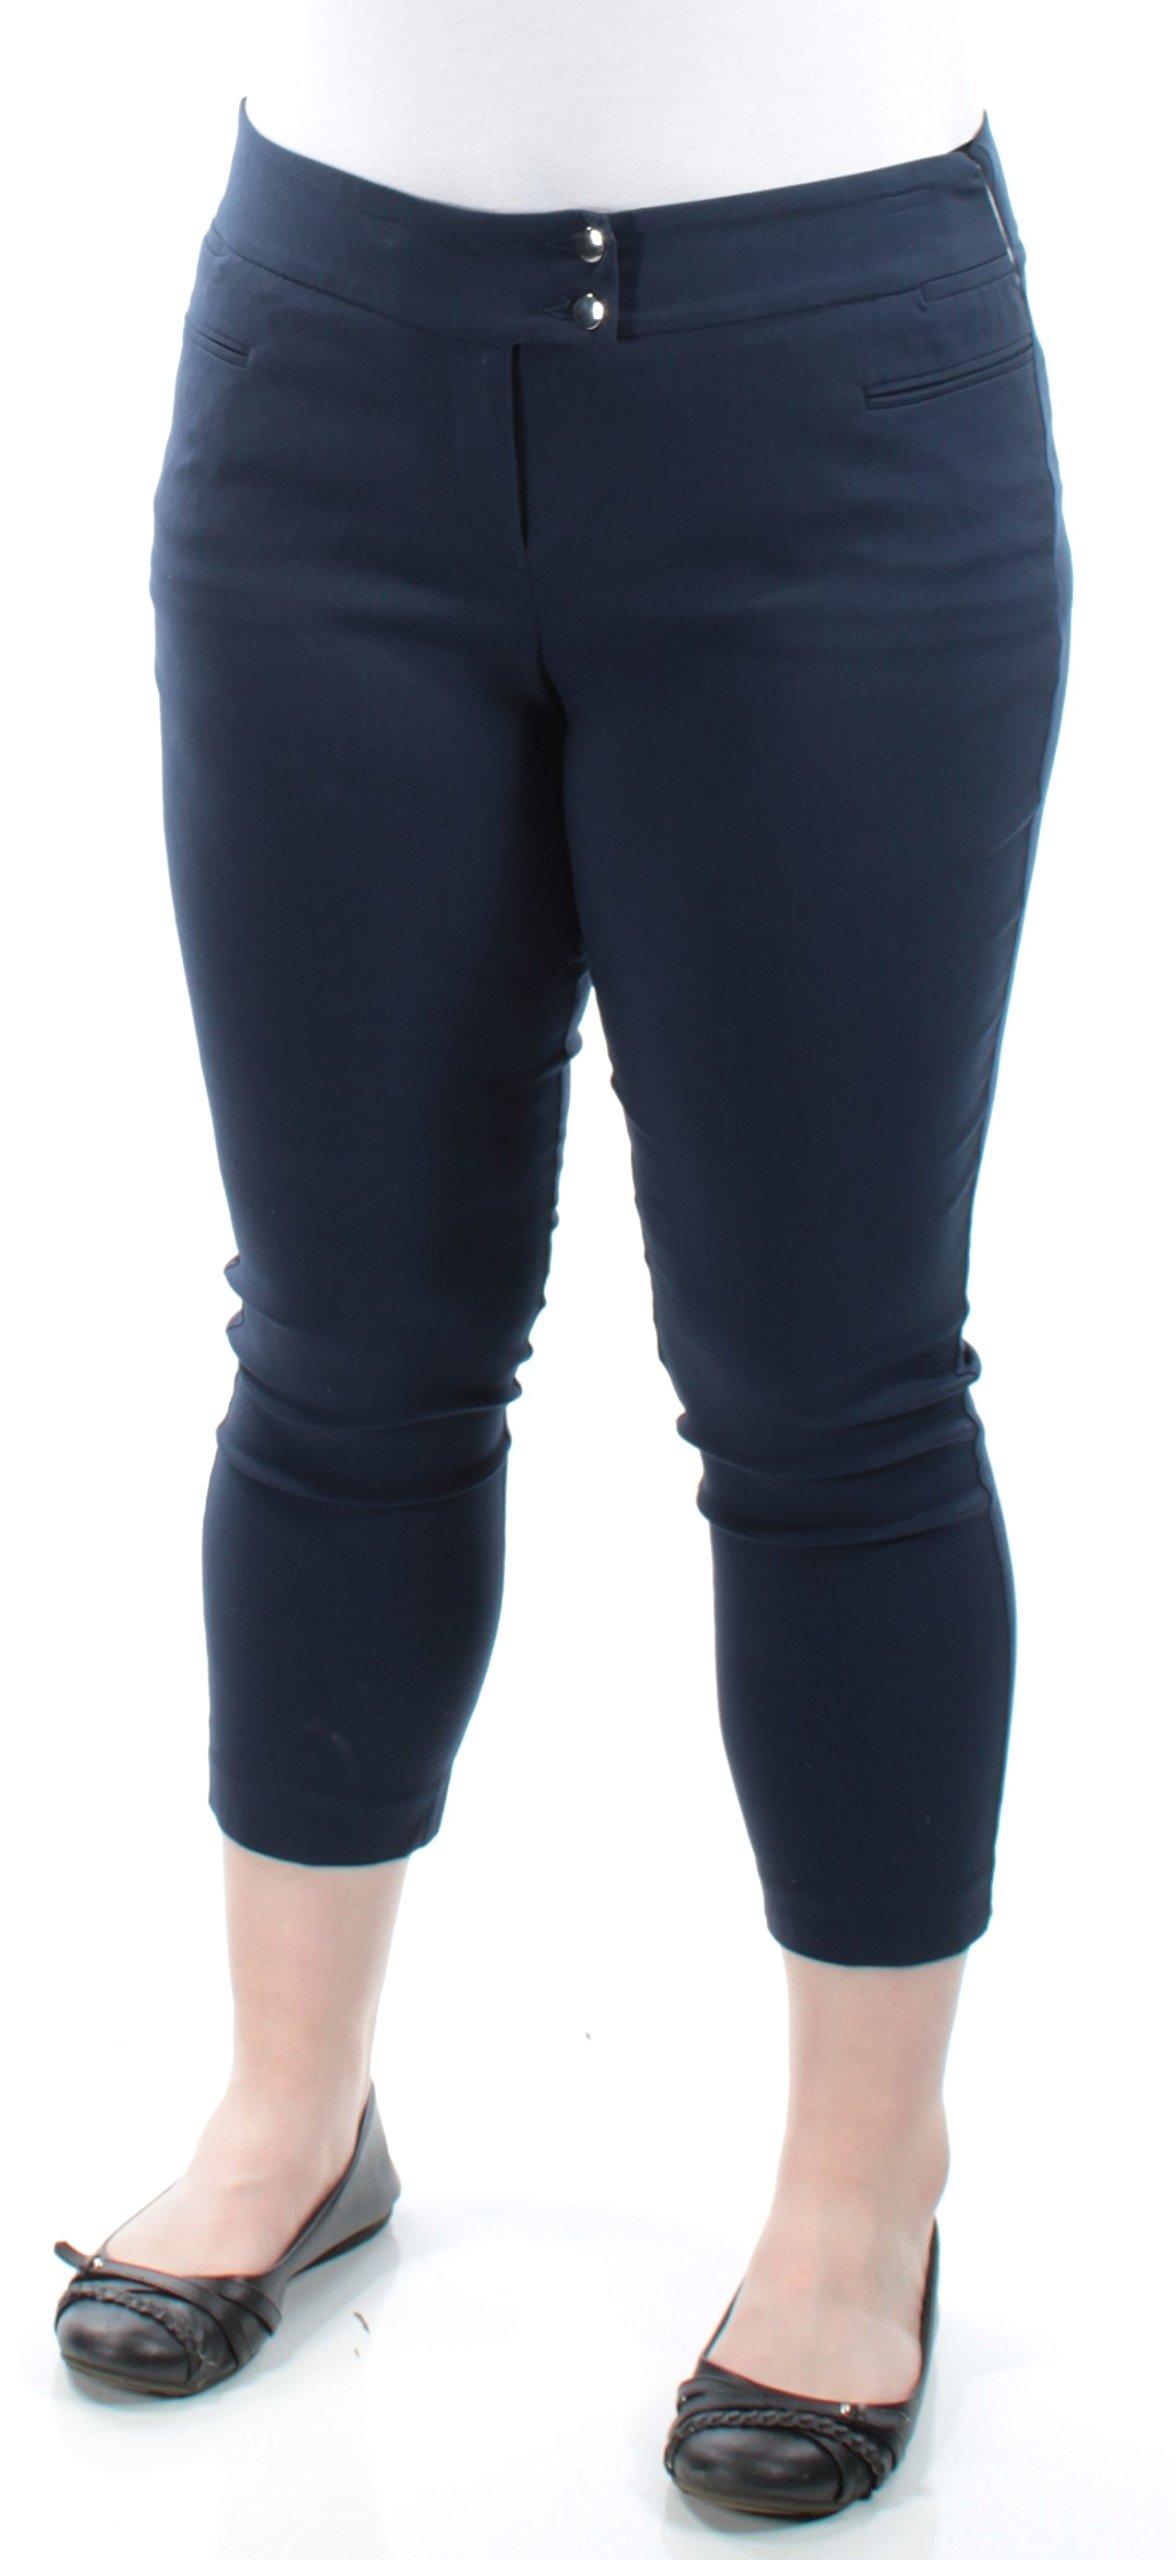 Style & Company $28 Womens 1404 Navy Comfort Waist Casual Pants Petites 14 B+B